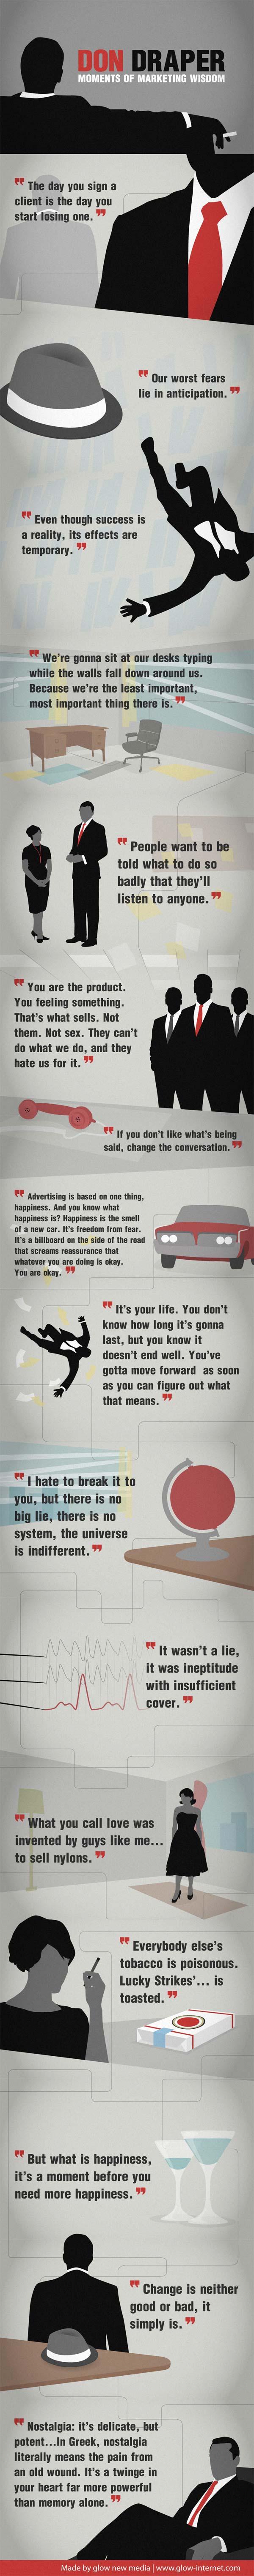 Marketing Wisdom from Don Draper